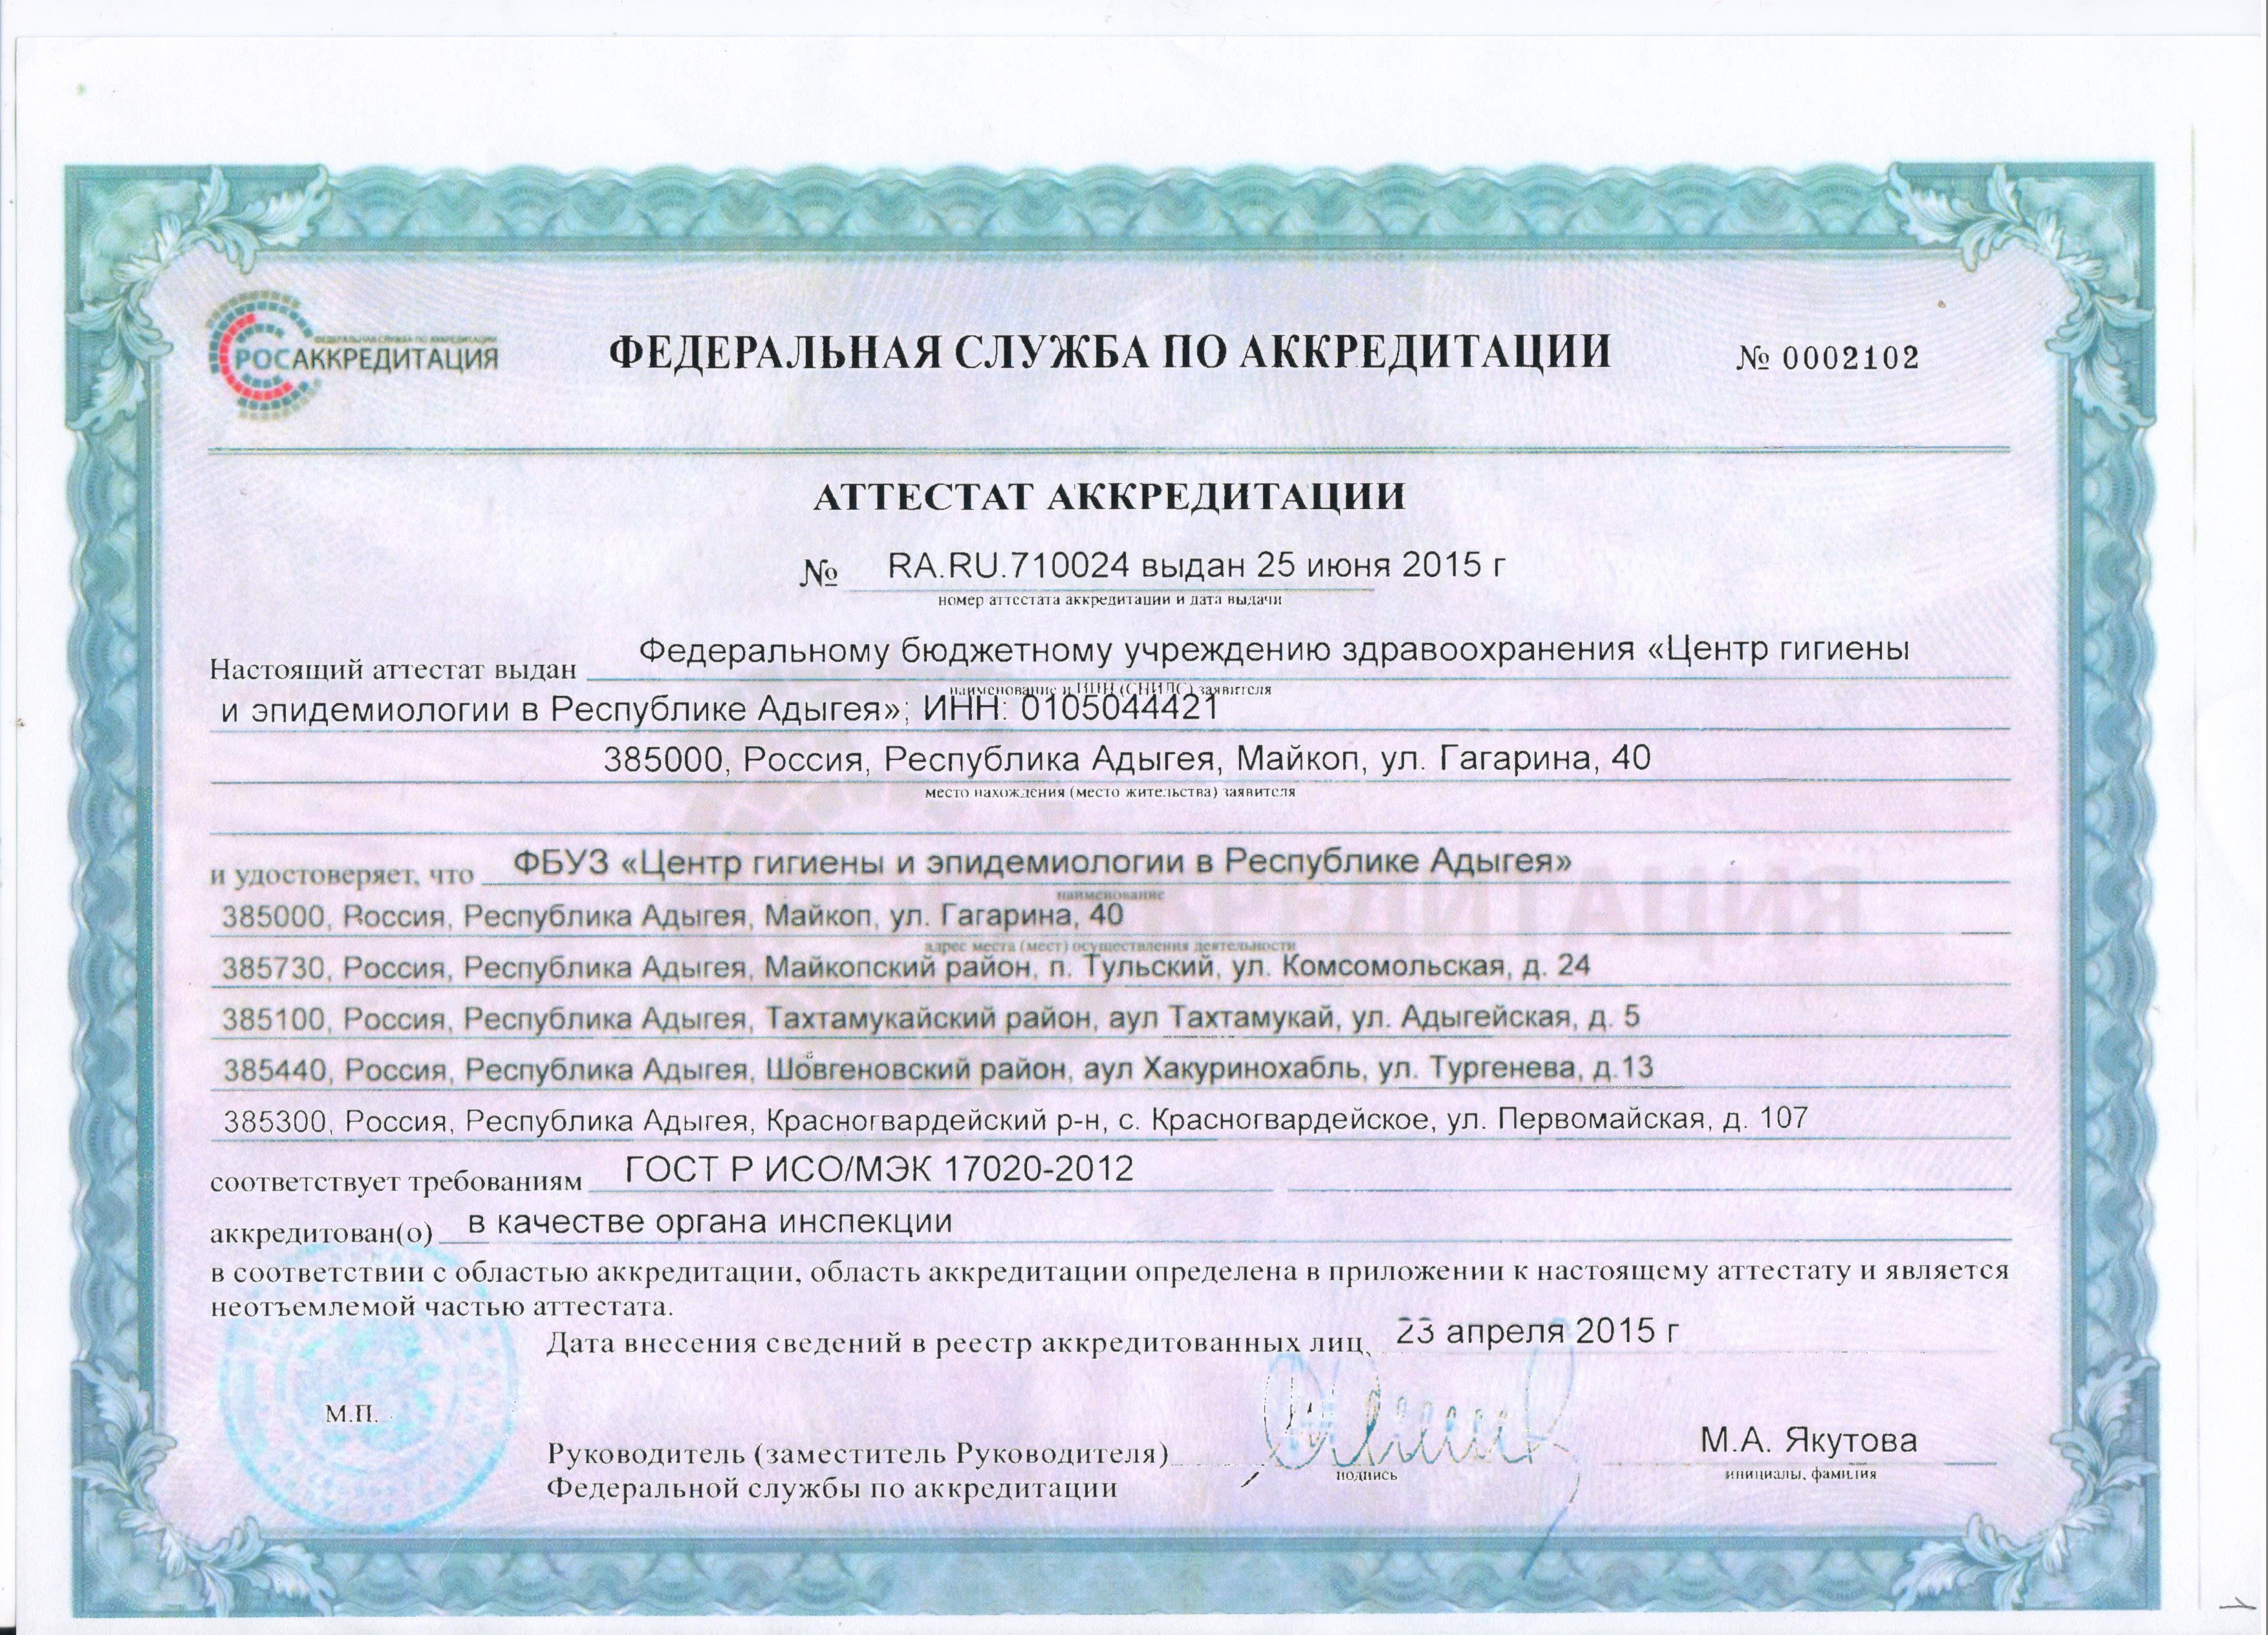 http://fbuz01.rospotrebnadzor.ru/s/218/storage/001_1.jpg